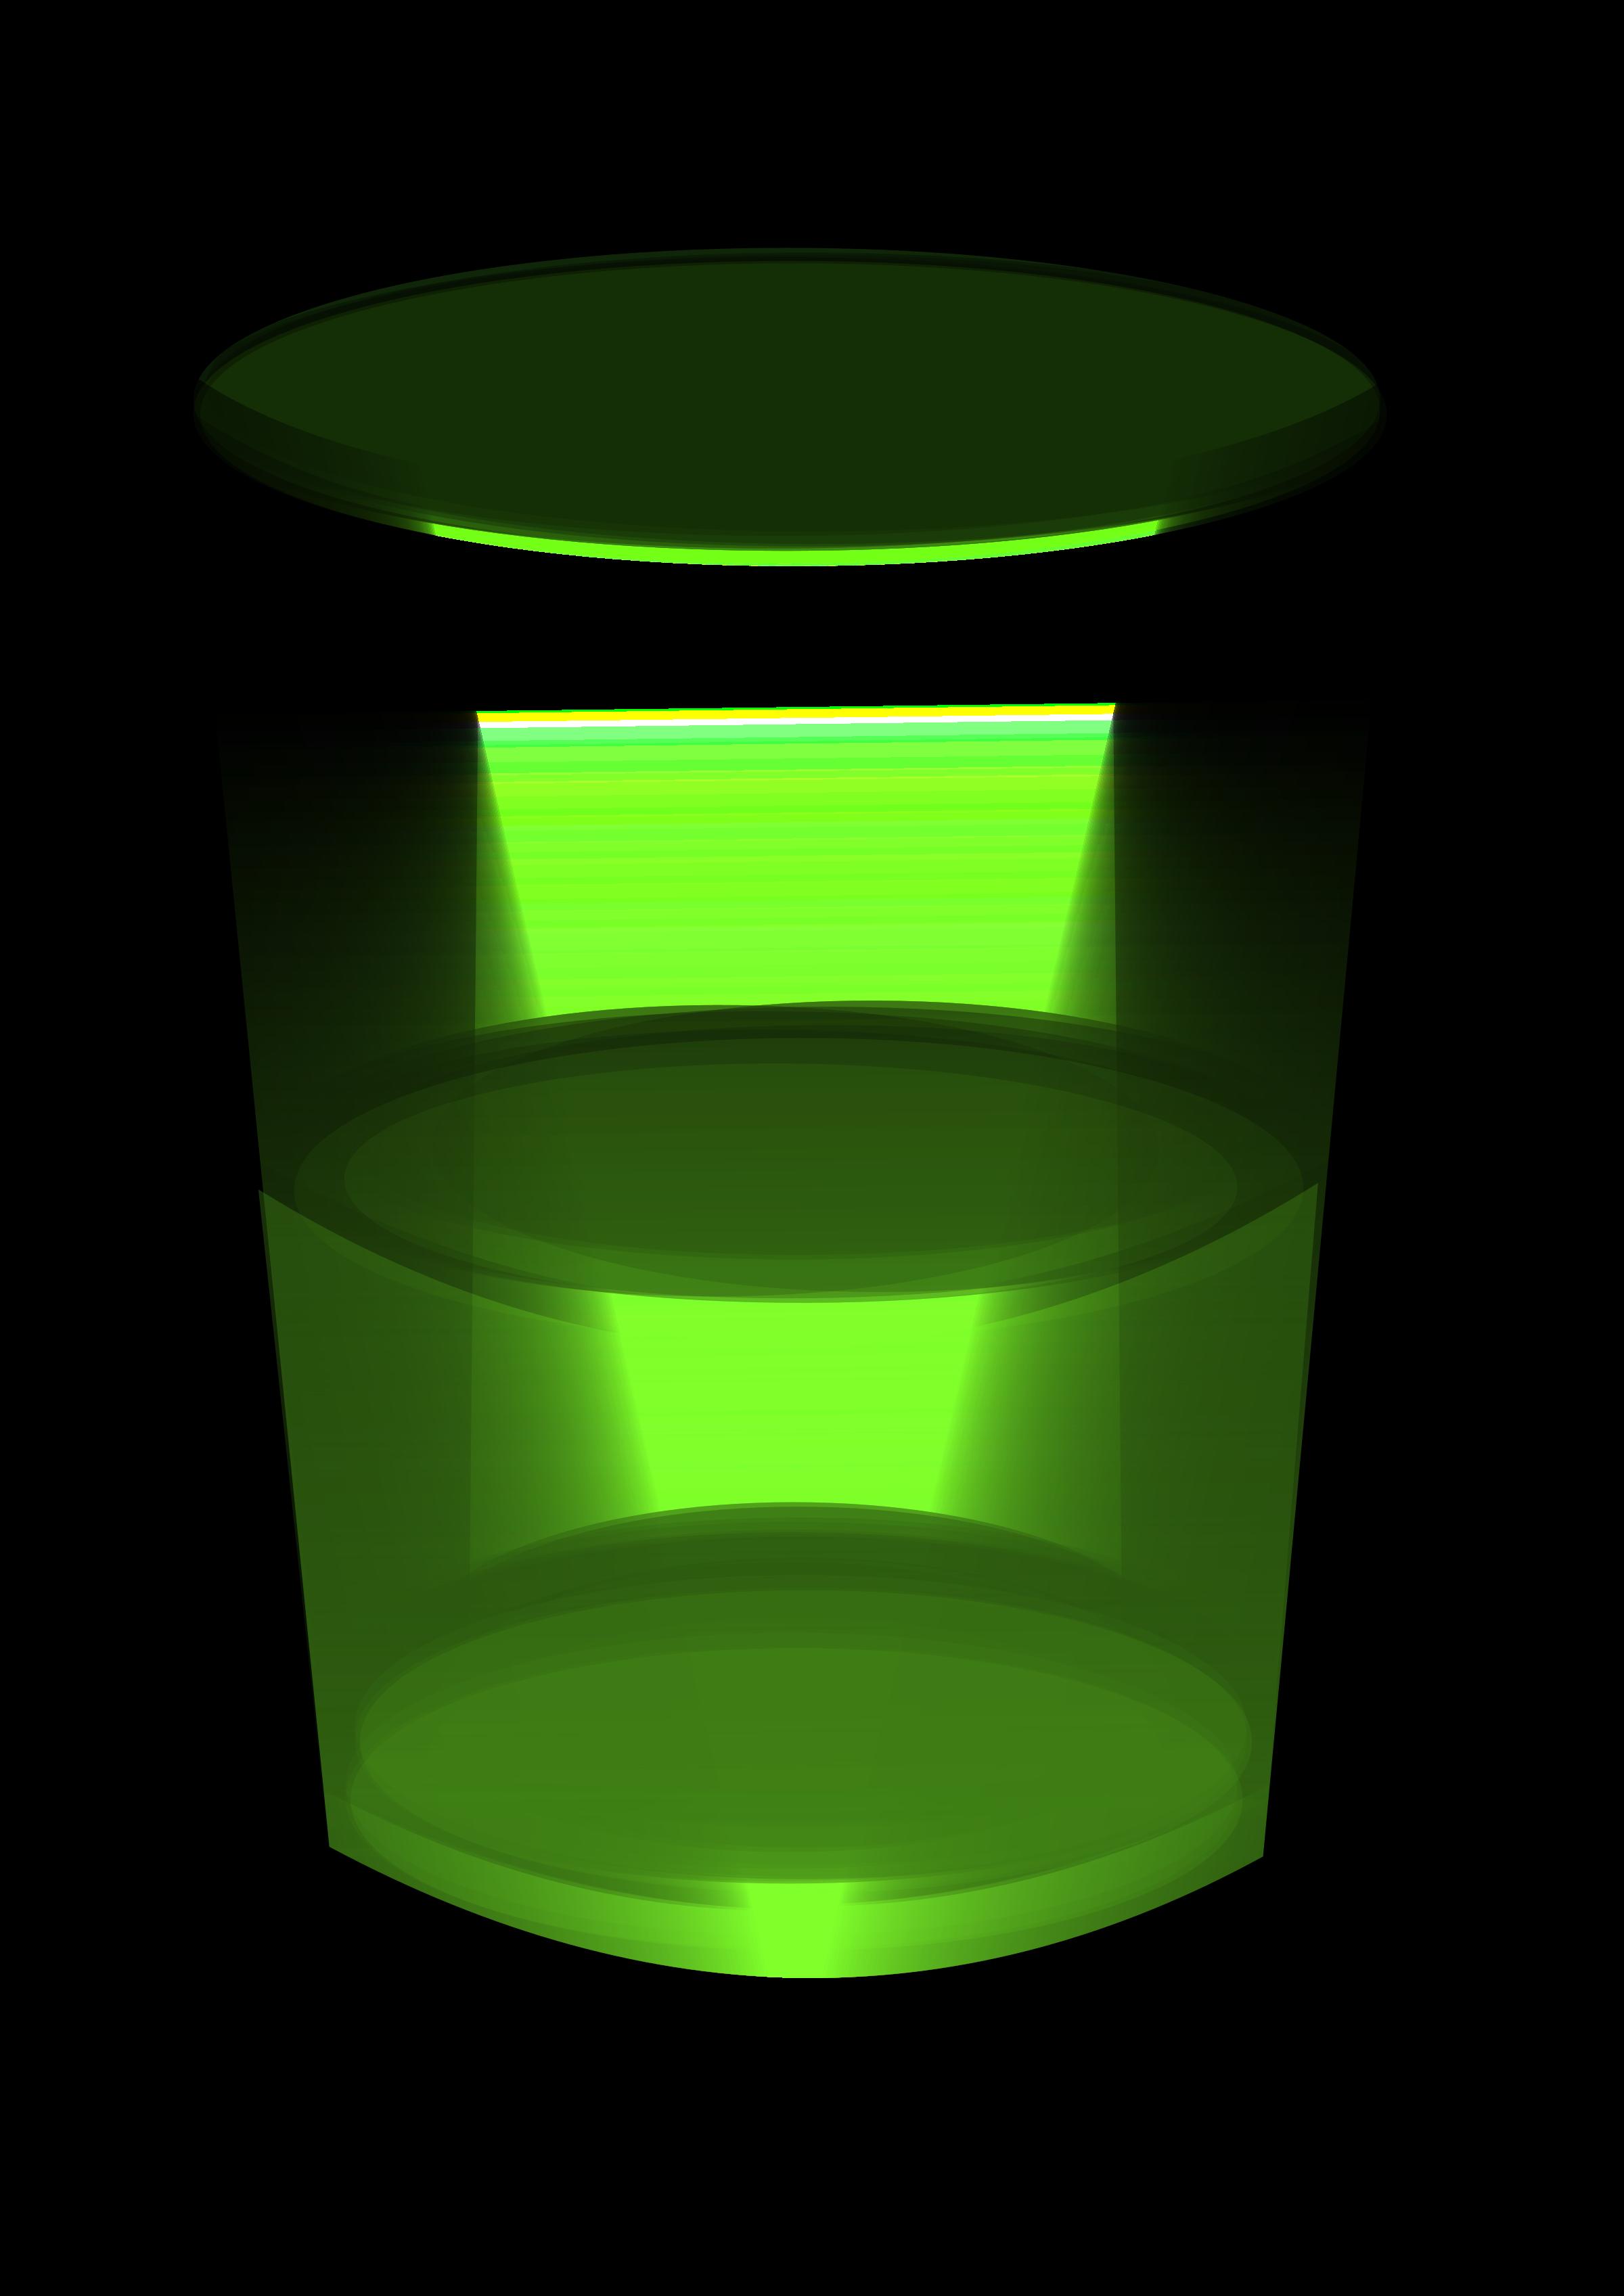 Green water big image. Shot clipart glass tumbler